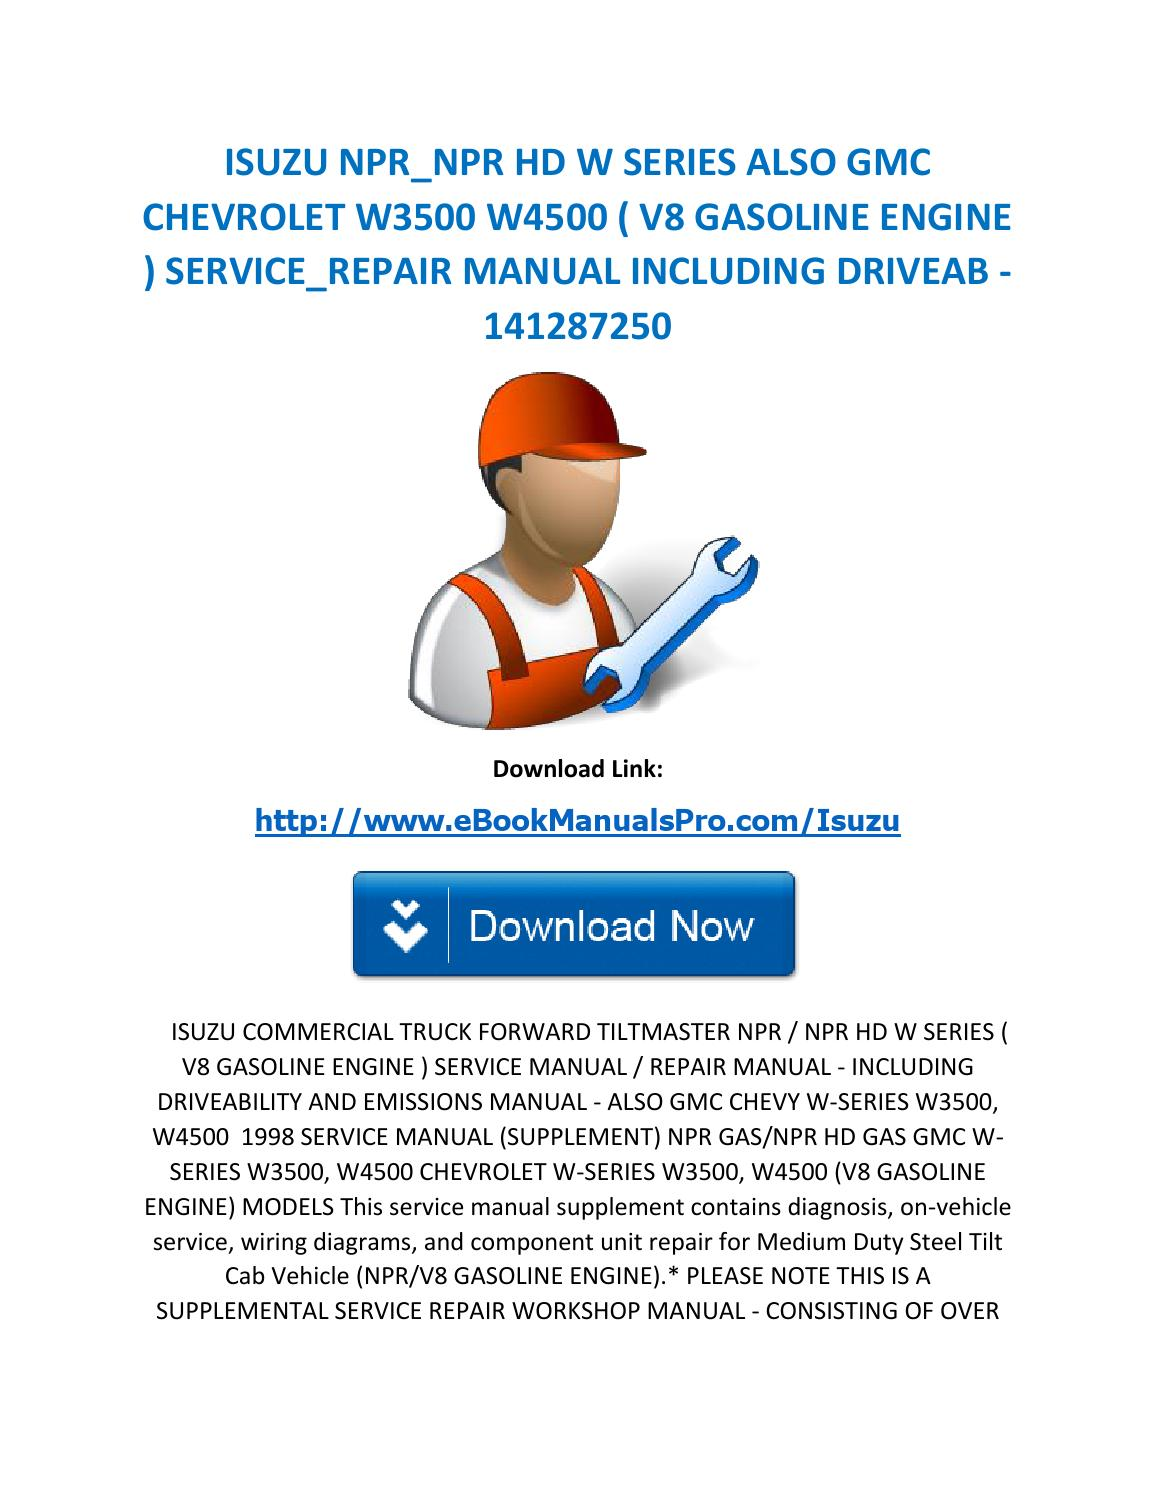 Isuzu npr npr hd w series also gmc chevrolet w3500 w4500 ( v8 gasoline  engine ) service repair manua by karl casino - issuu